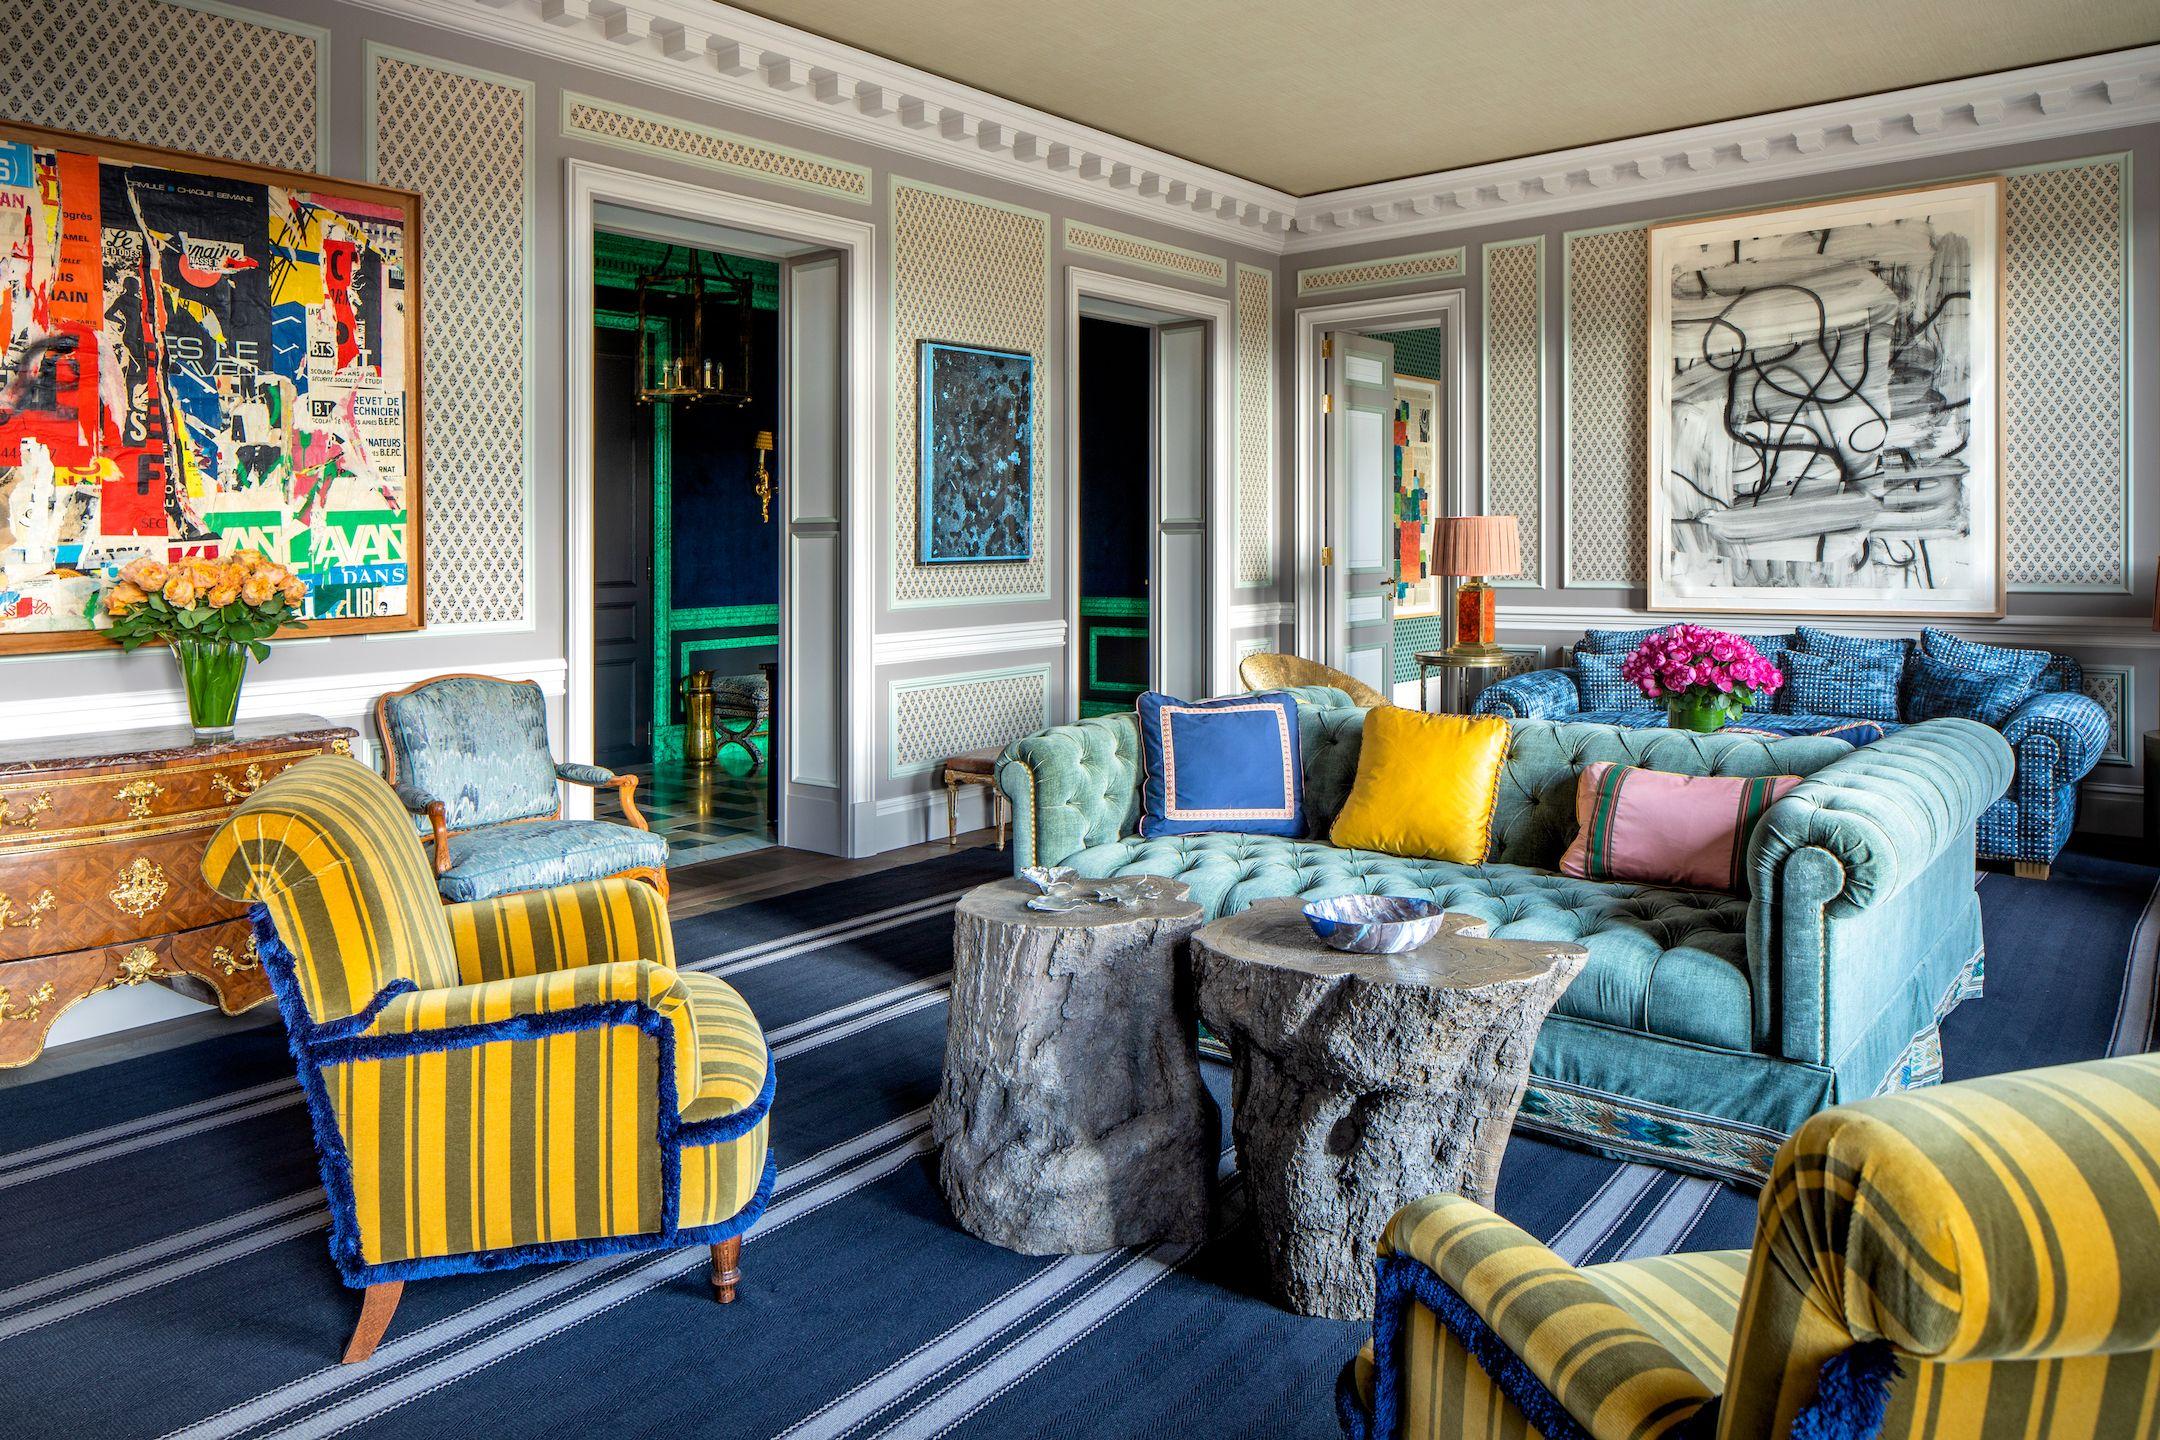 Paris Apartment by Lorenzo Castillo. Ricardo Labougle photogrpahy